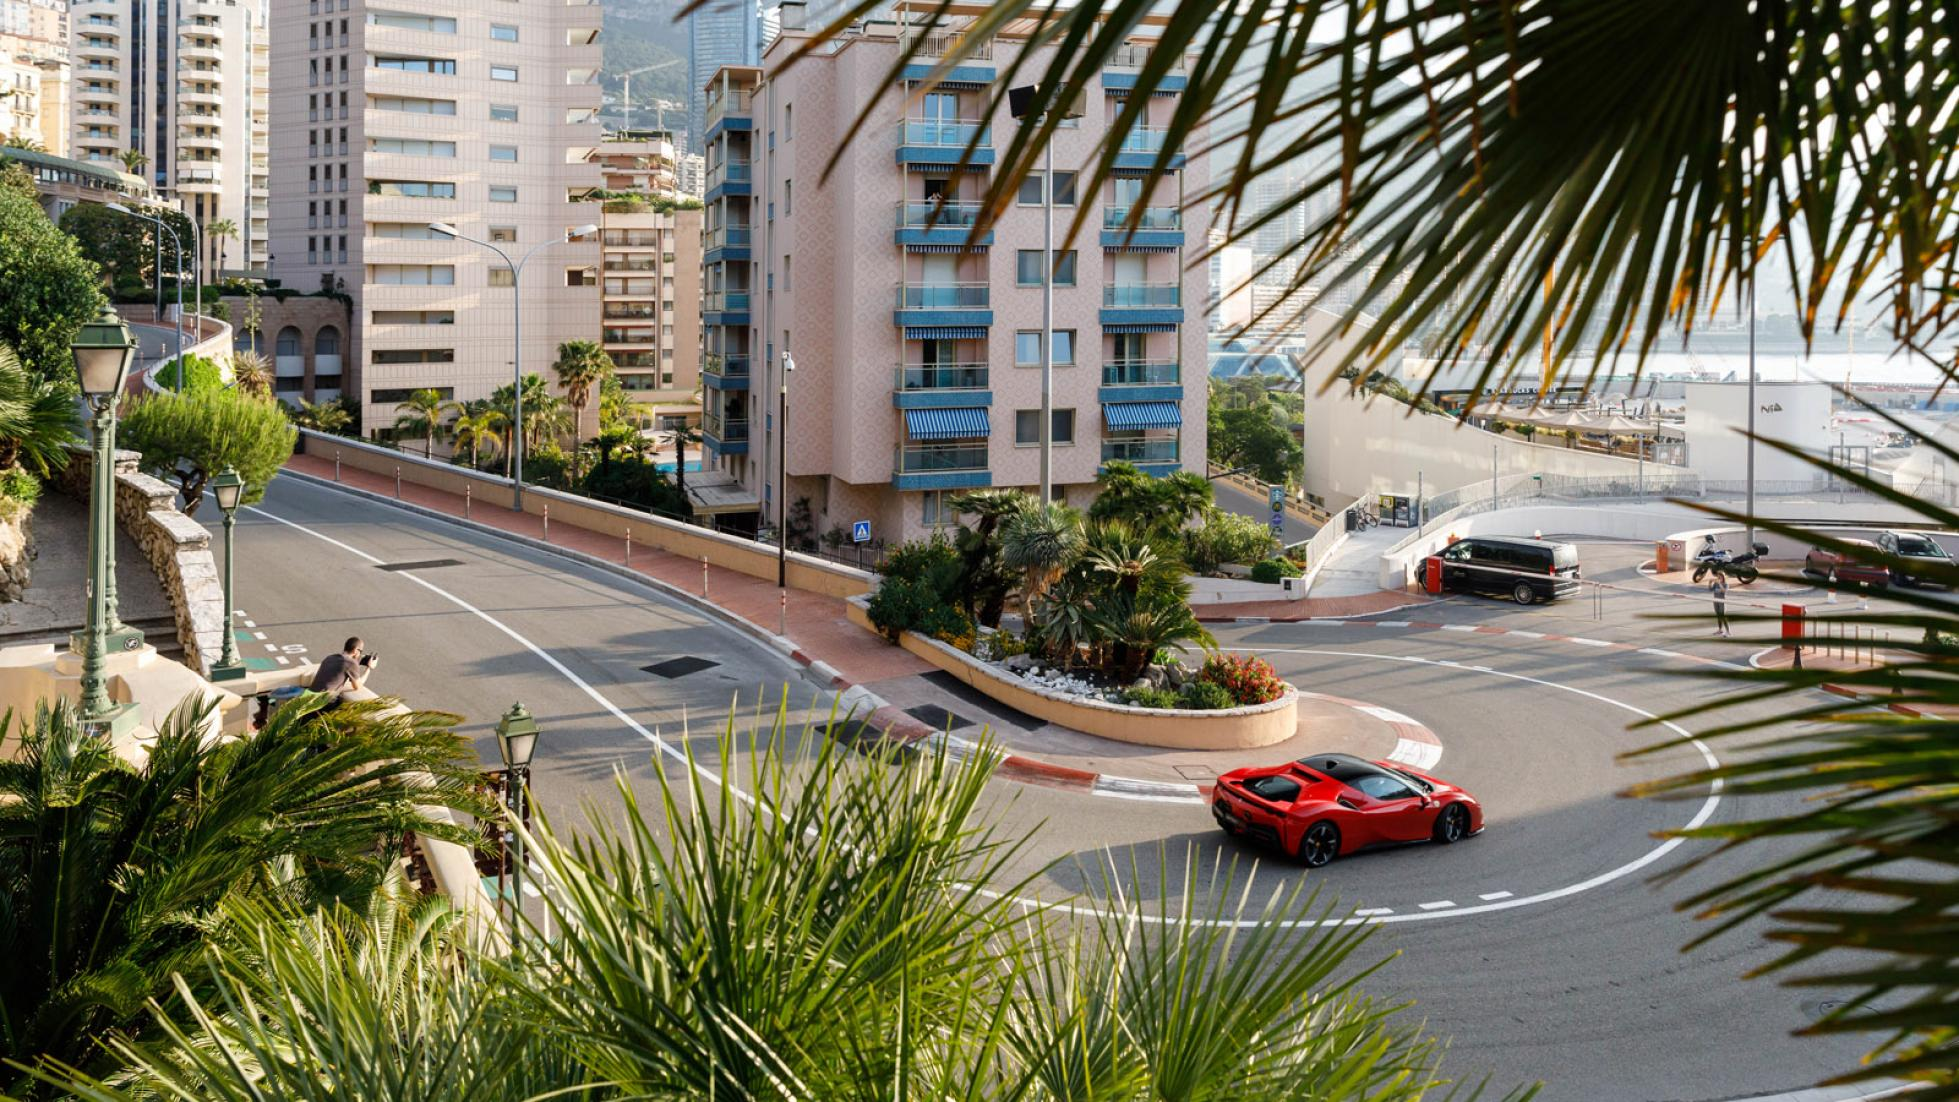 Charles-Leclerc-Ferrari-SF90-Stradale-Monaco-7